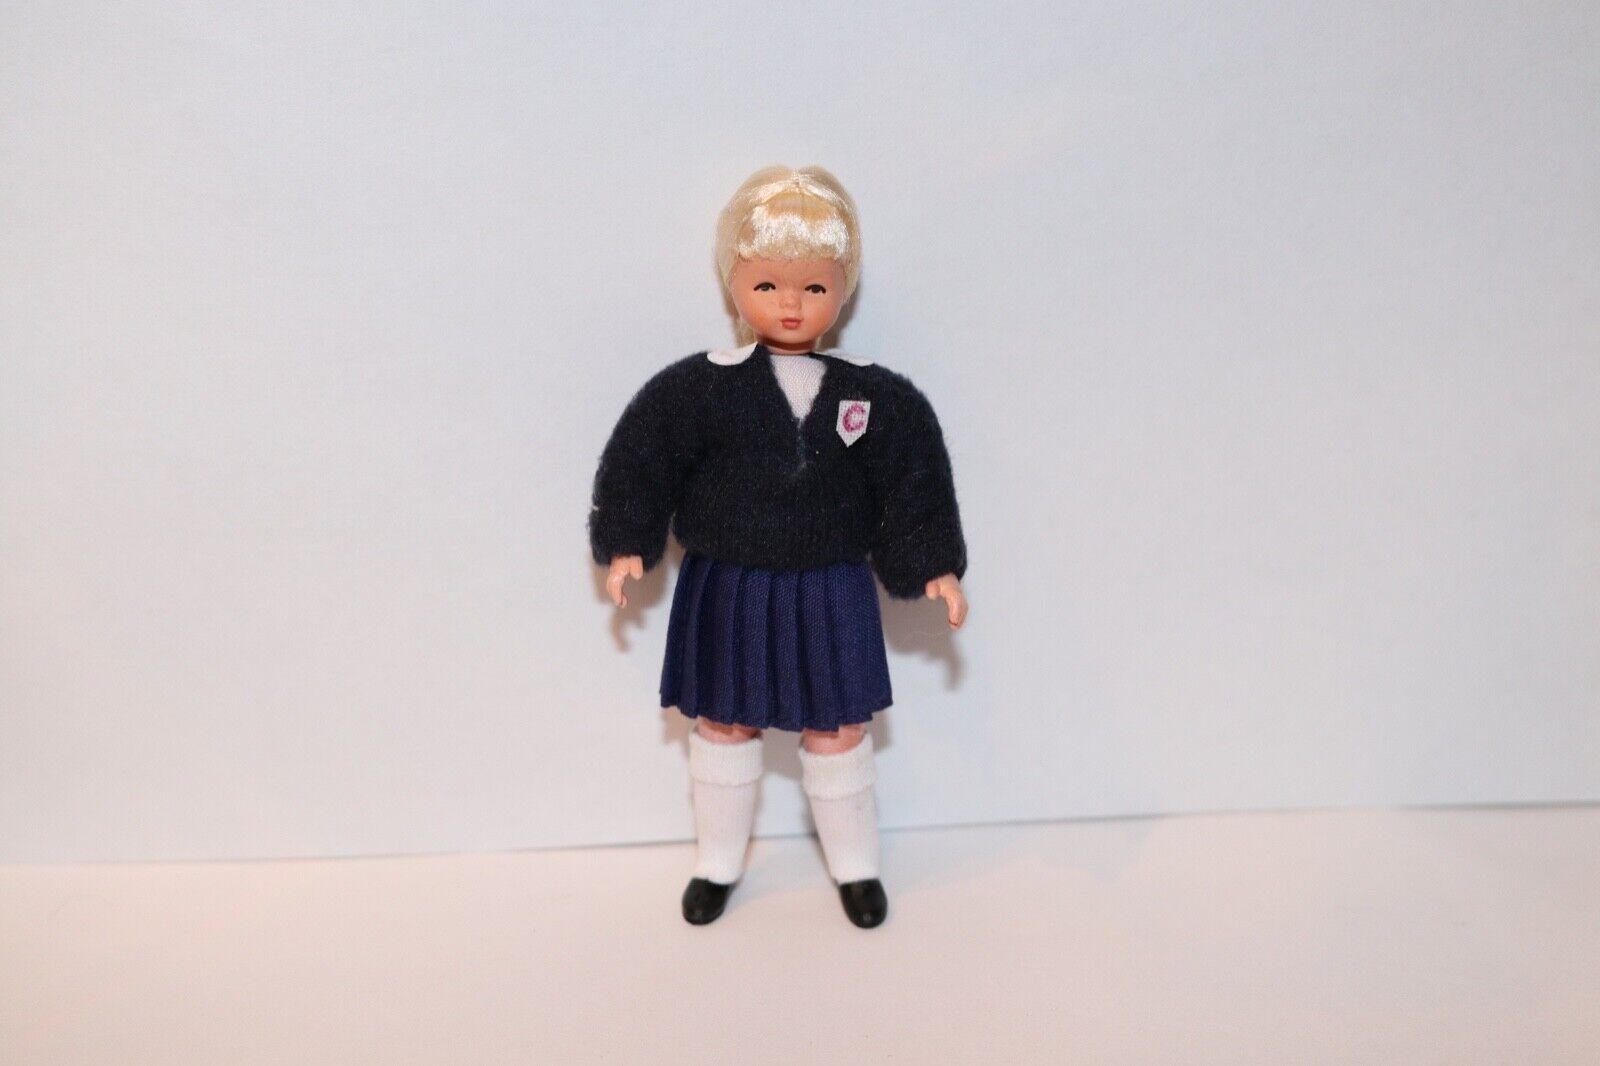 Caco Girl Doll Germany Modern Dollhouse Miniature German NIB Retirot School Girl